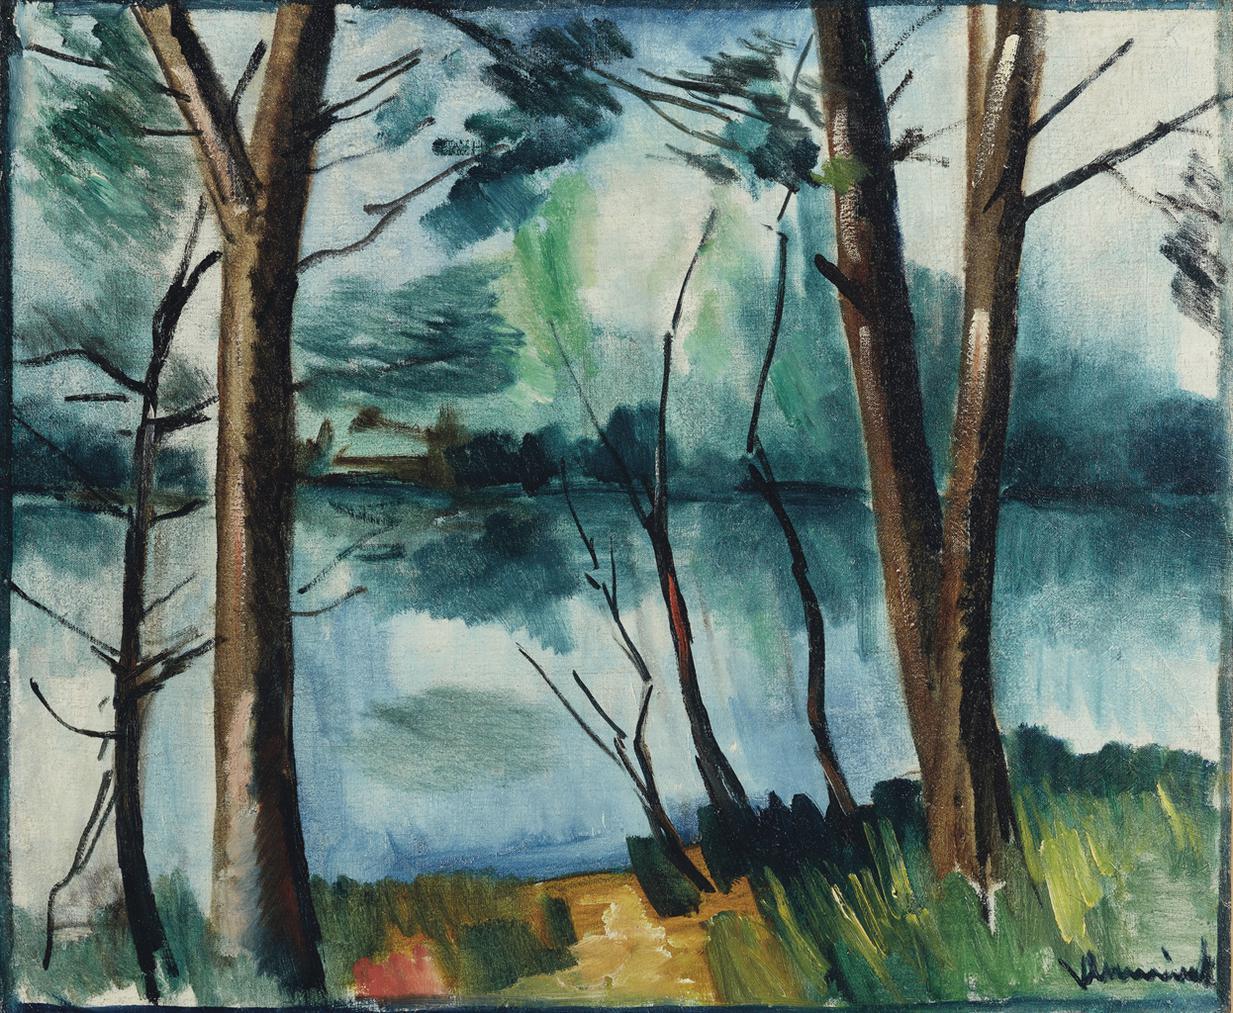 Maurice de Vlaminck-Paysage De Riviere-1912